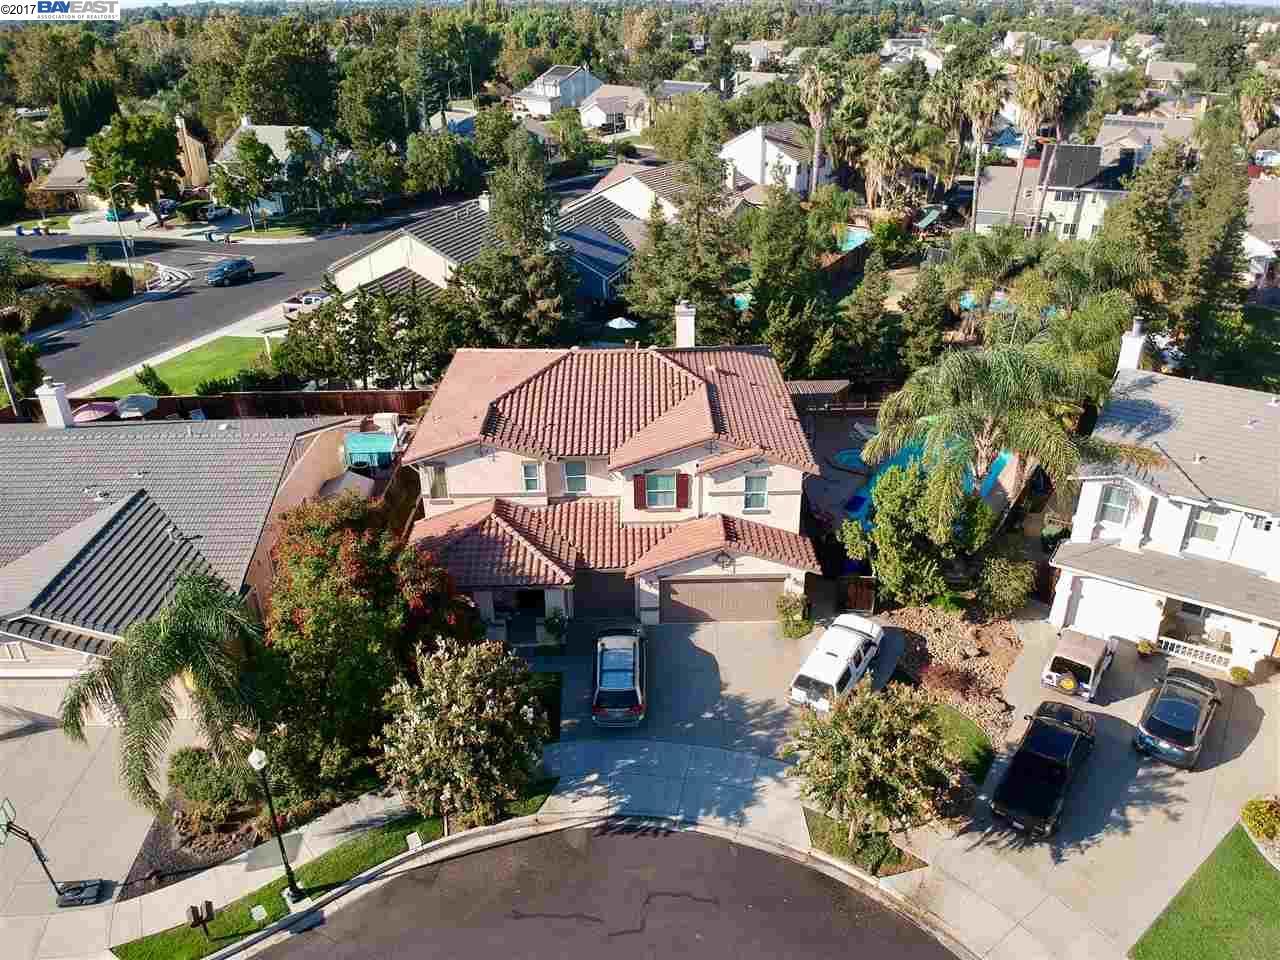 703 Como Ct, BRENTWOOD, CA 94513